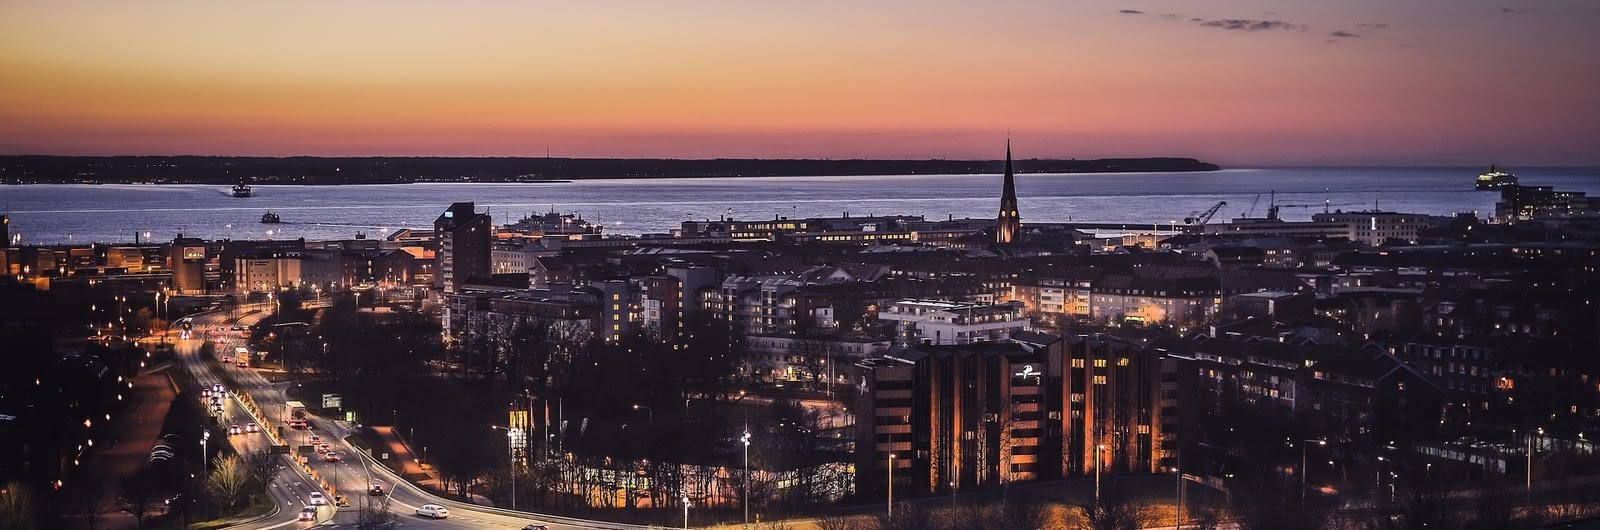 helsingborg city header